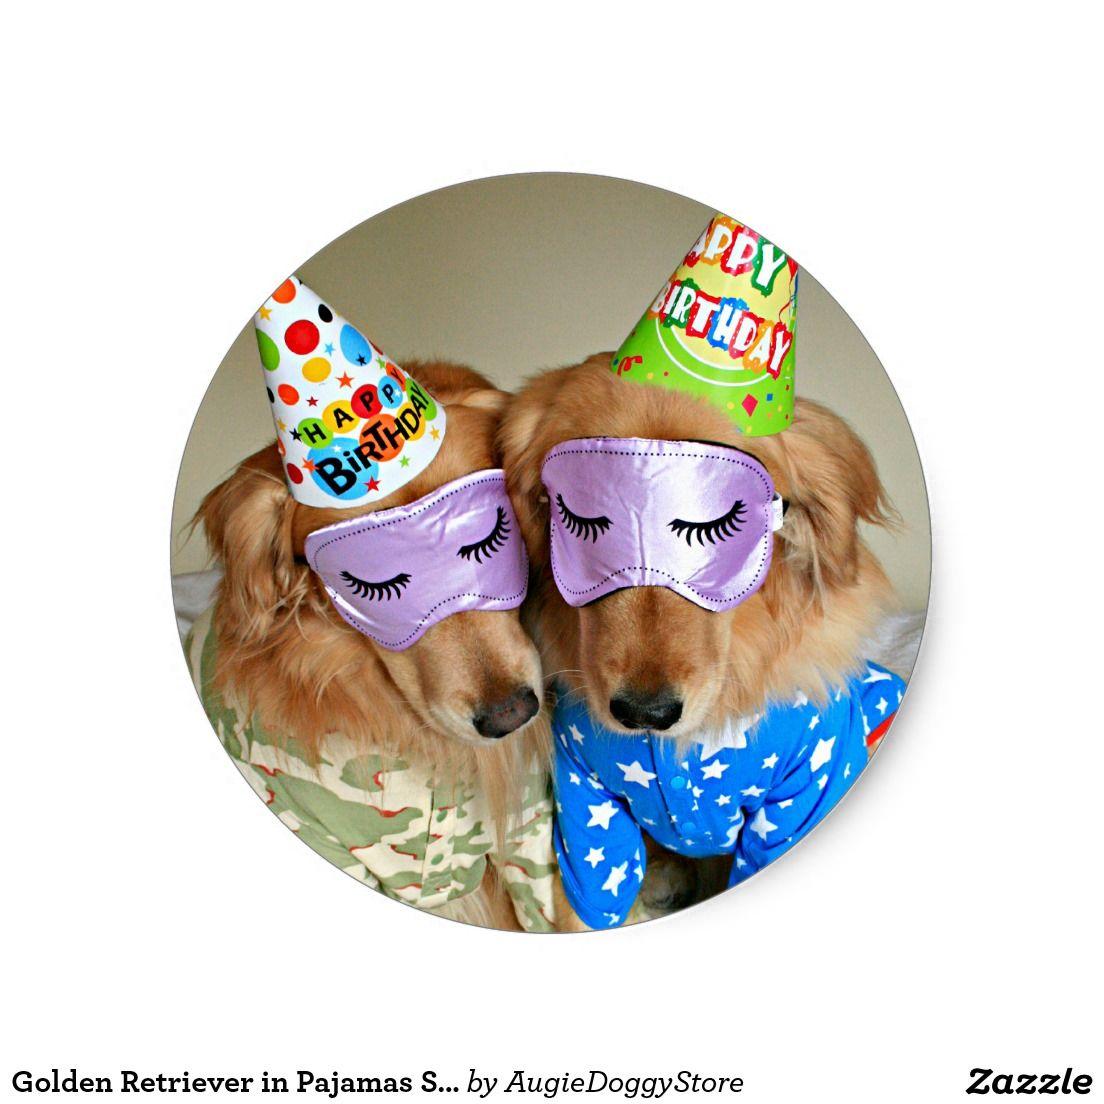 Golden retriever in pajamas sleep mask birthday classic